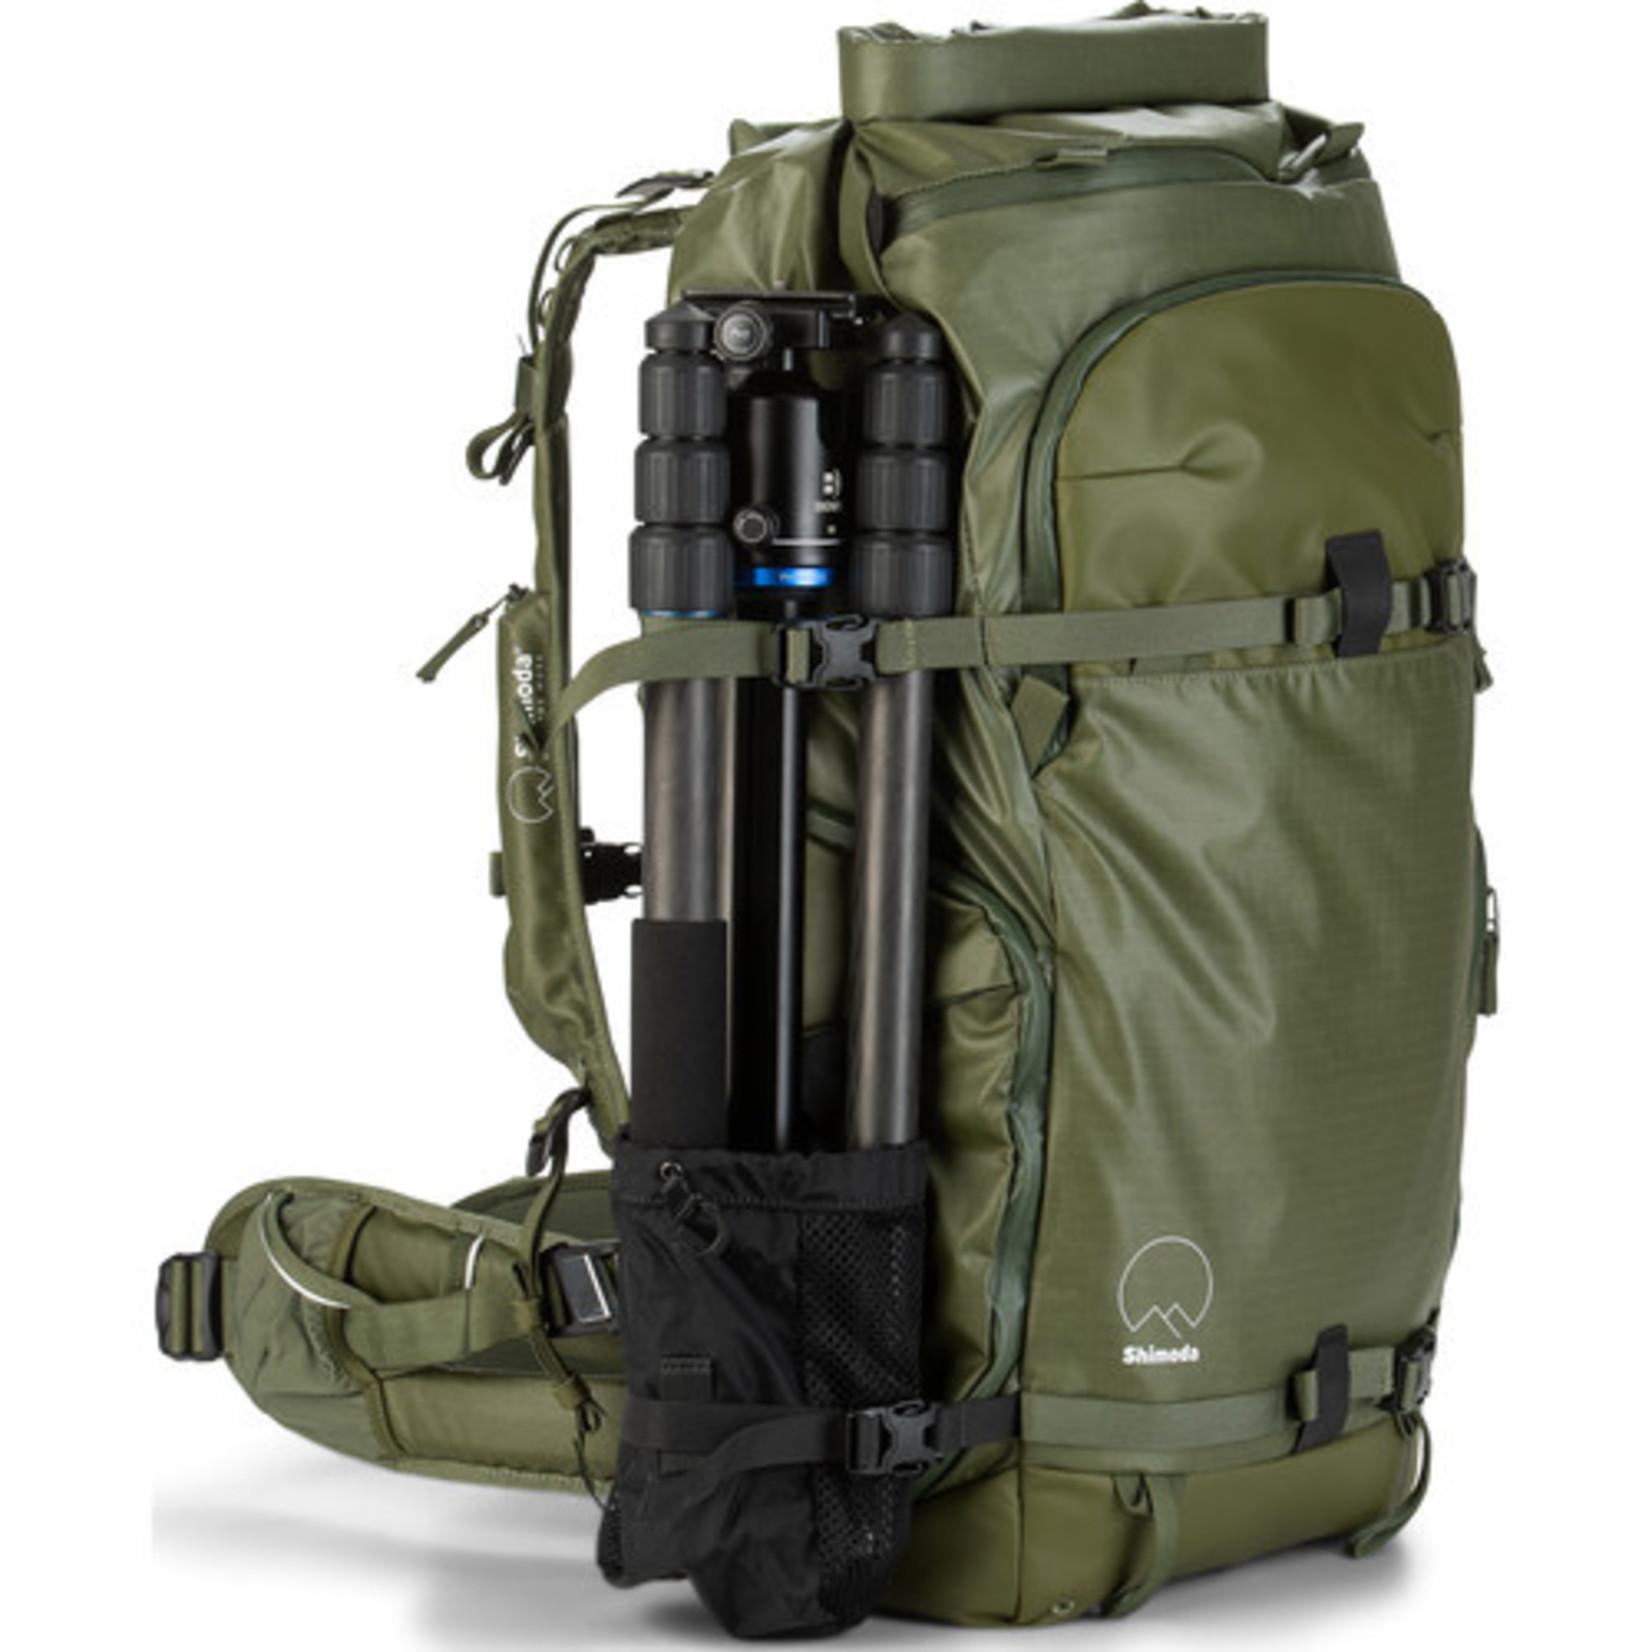 Shimoda Shimoda Action X50 Starter Kit (w/ Medium DSLR Core Unit) - Army Green